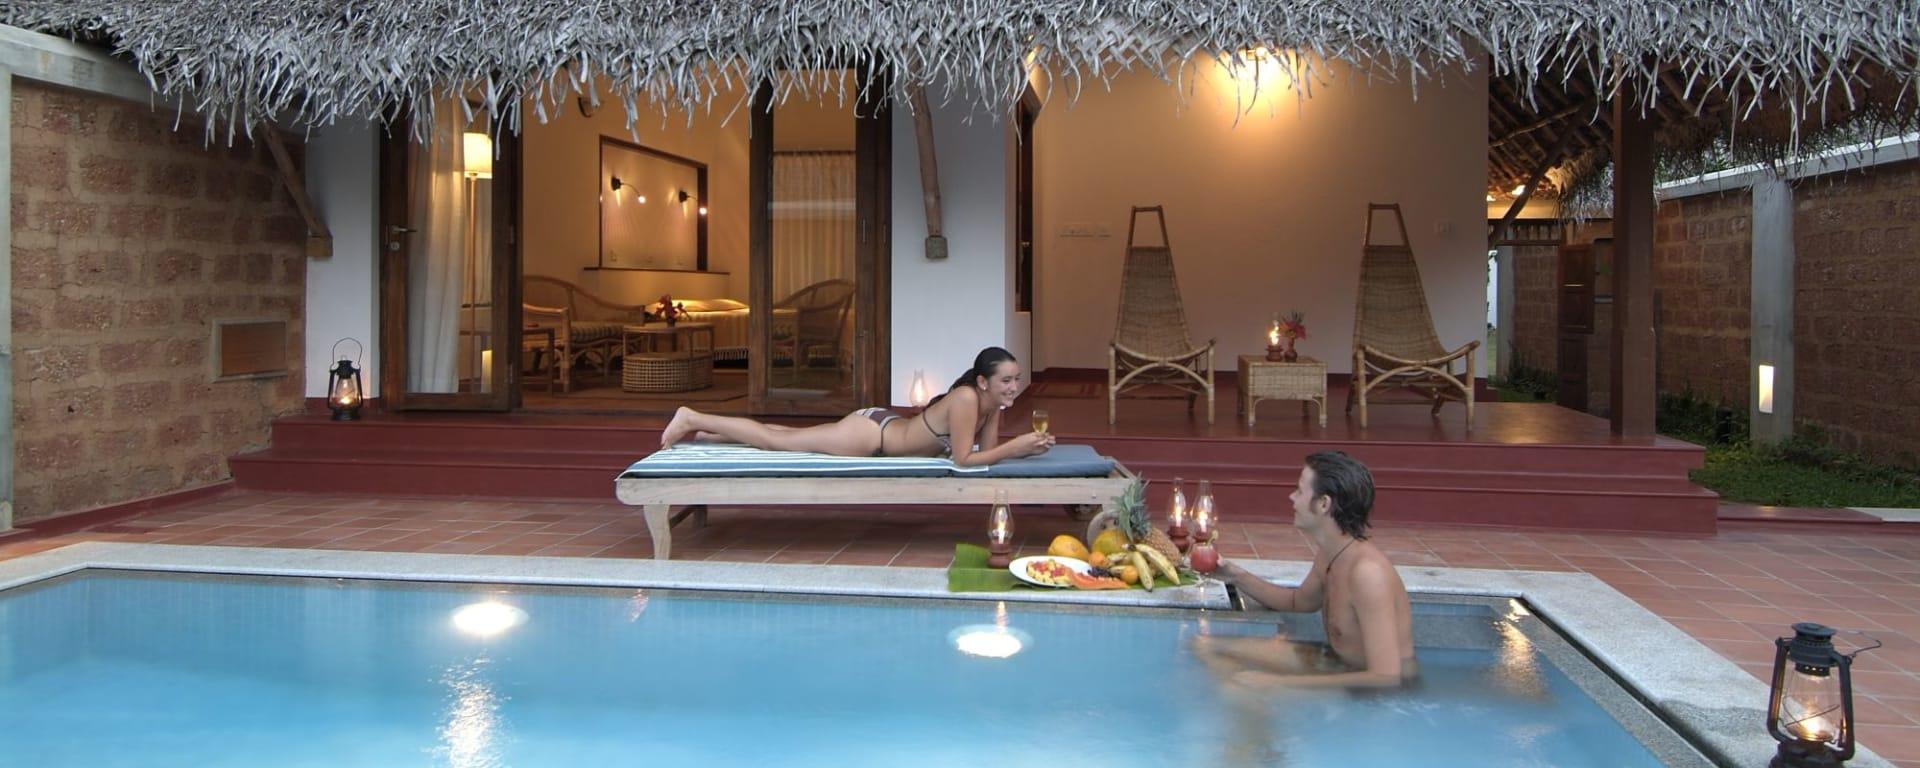 Marari Beach Resort à Mararikulam: Garden Villa with private pool